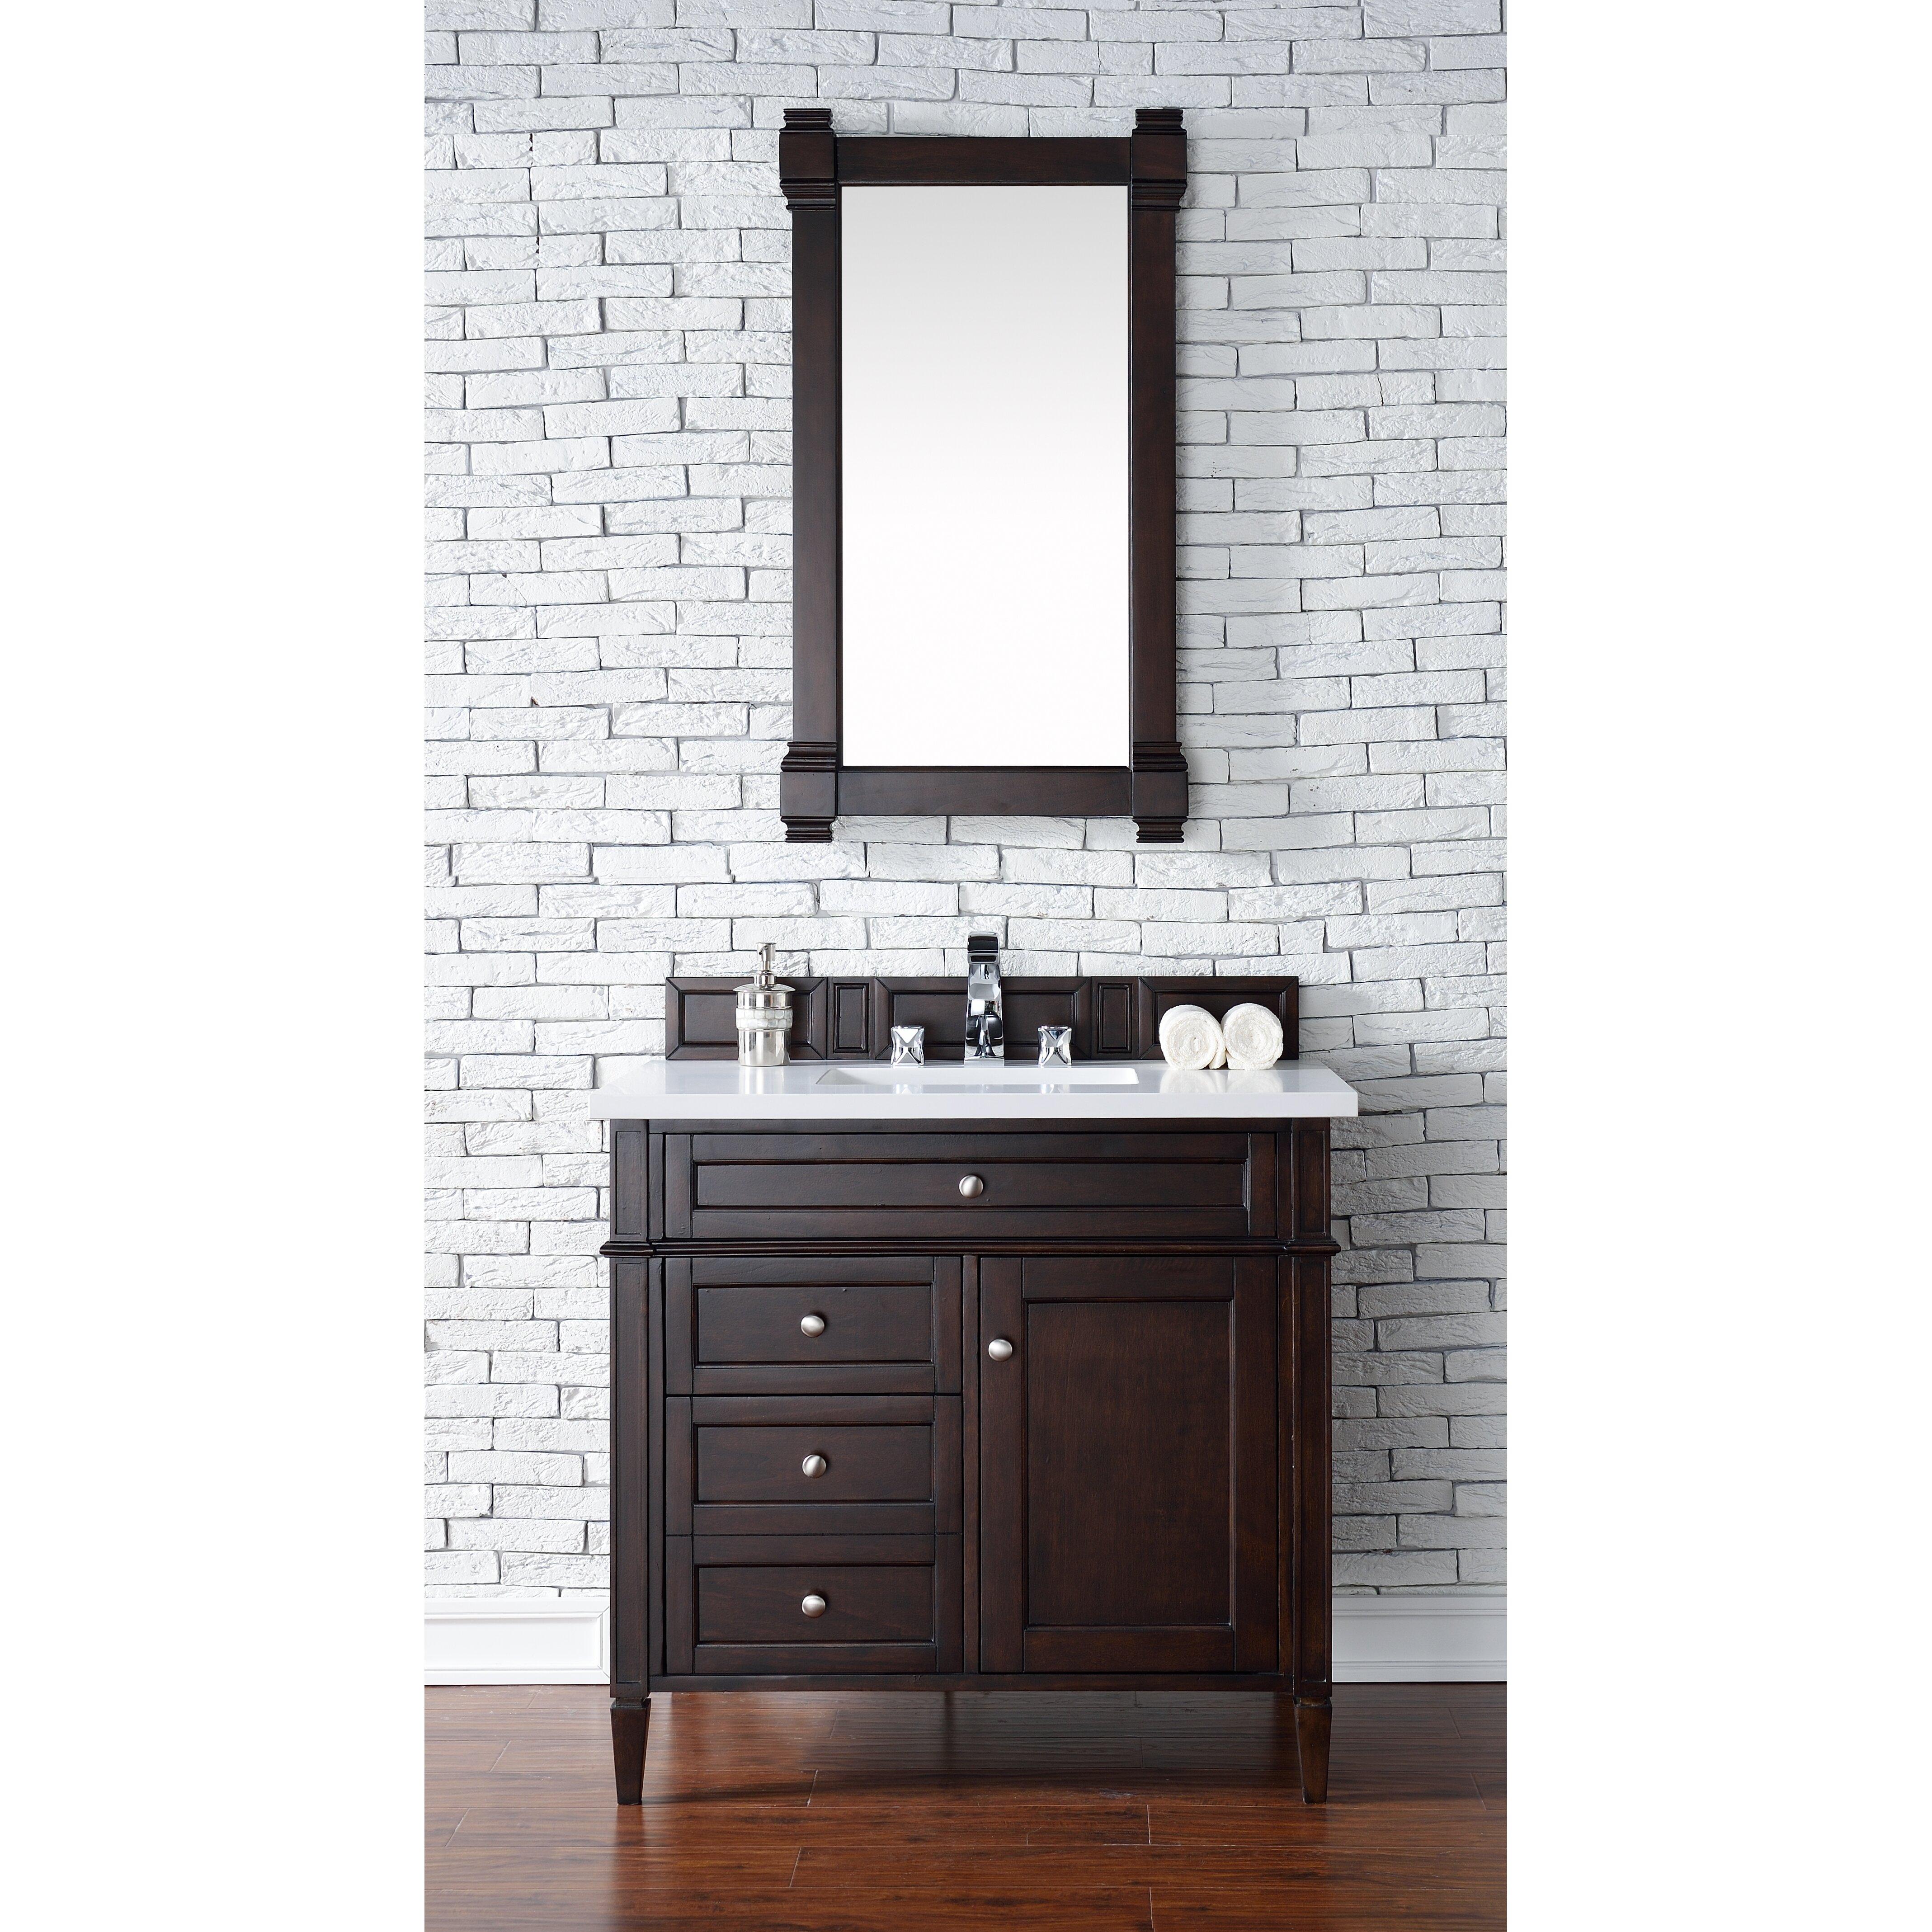 Bathroom Vanity Base James Martin Furniture Brittany 36 Single Bathroom Vanity Base